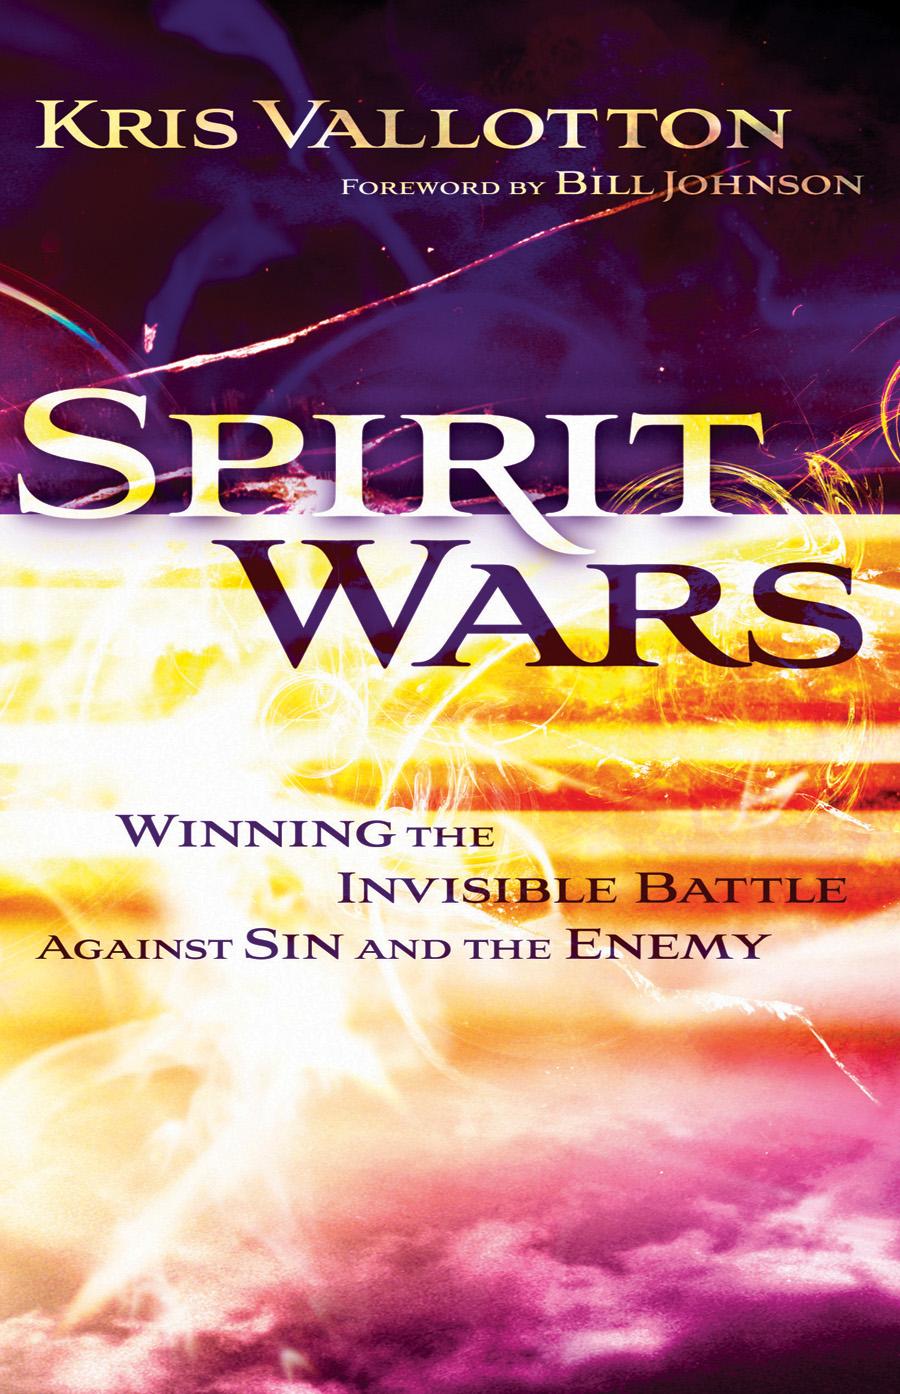 Image result for spirit wars kris vallotton